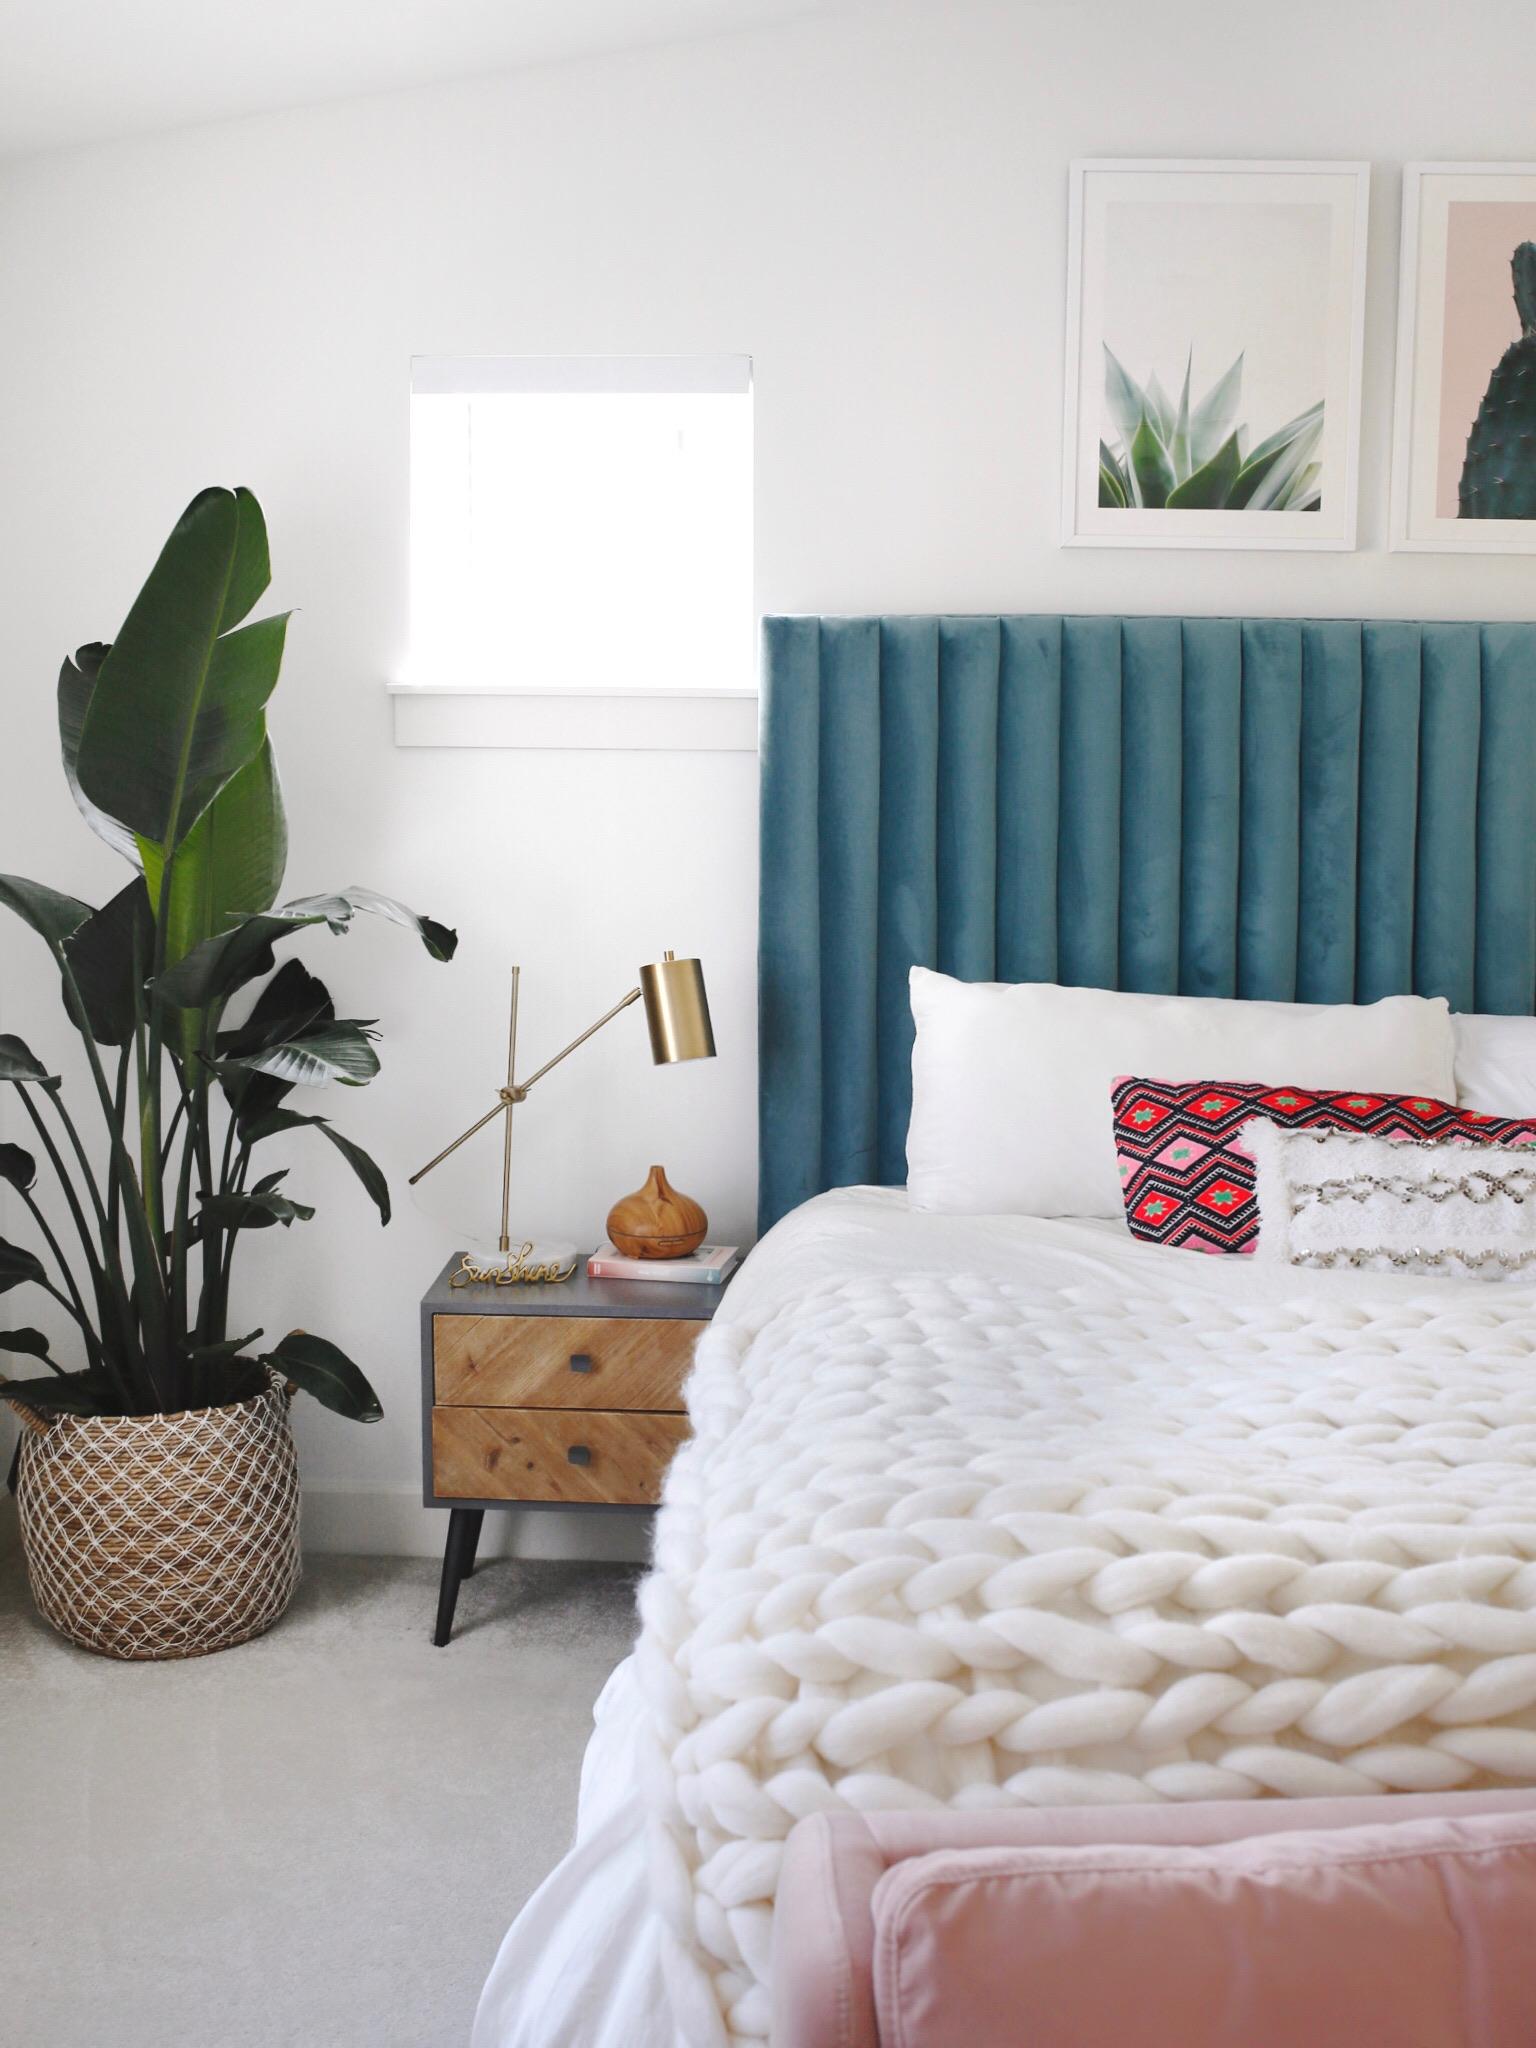 Boho Chic Bedroom Reveal | Gypsy Tan